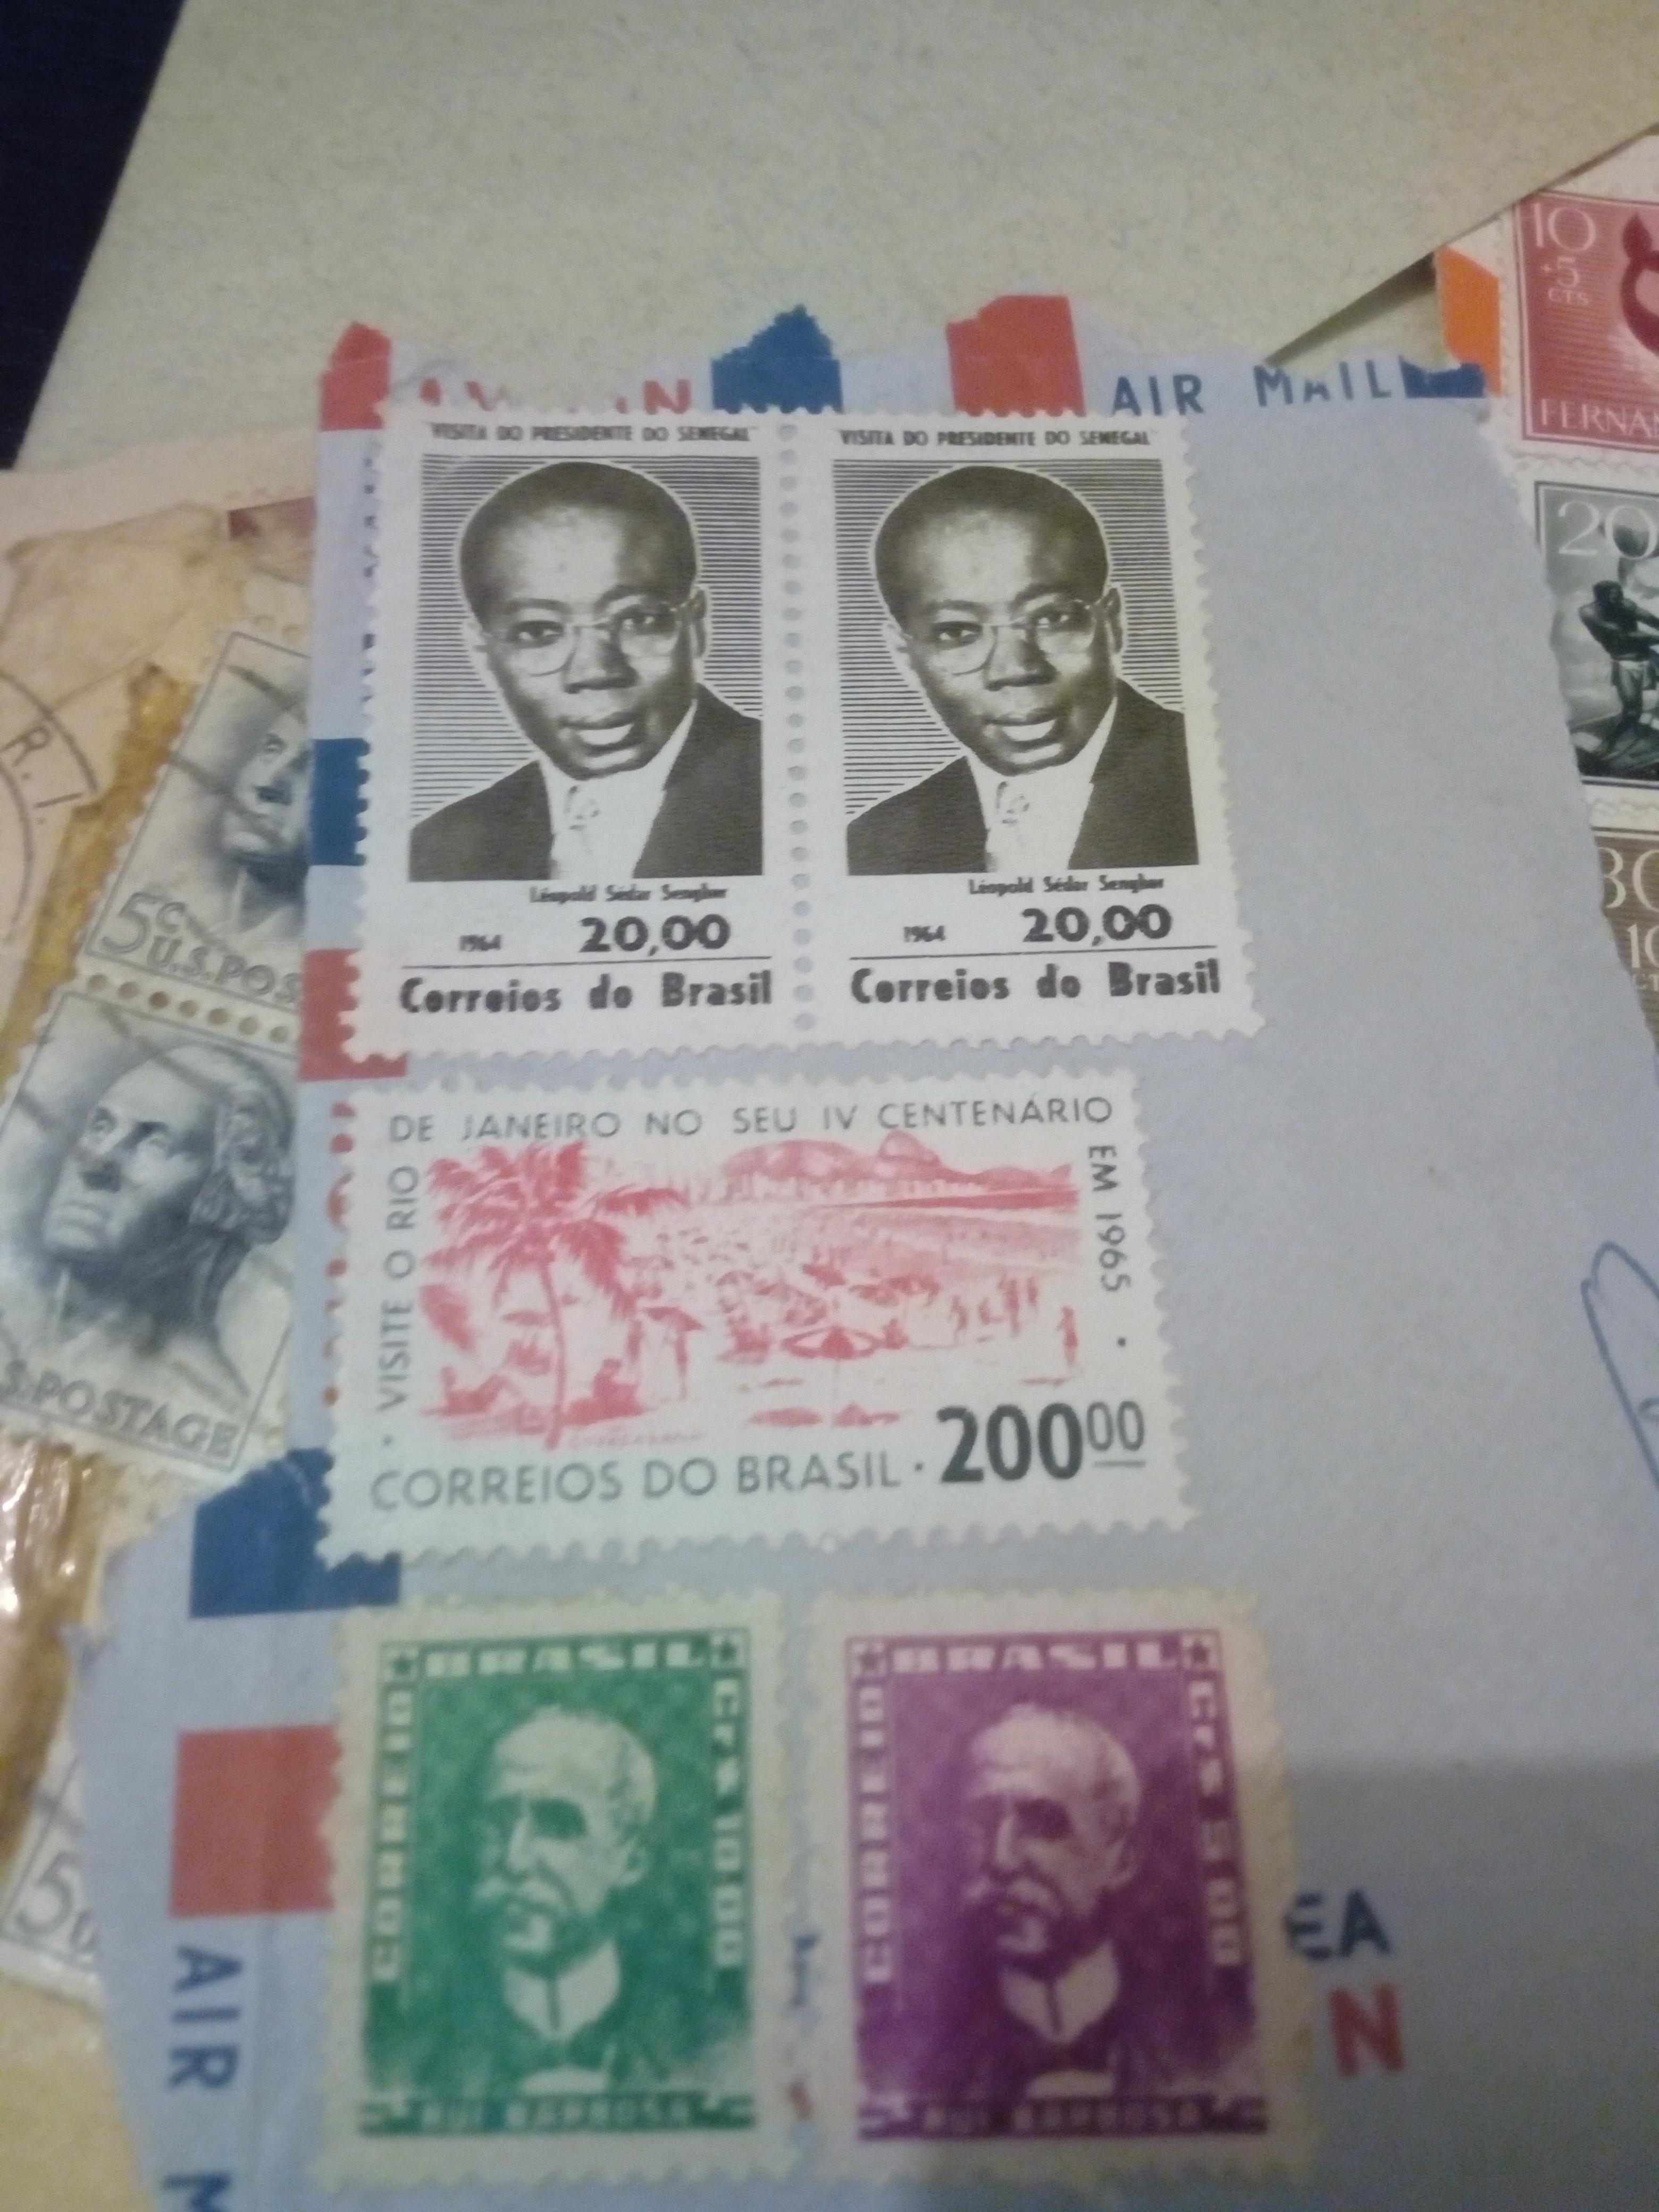 Francobolli Somalia